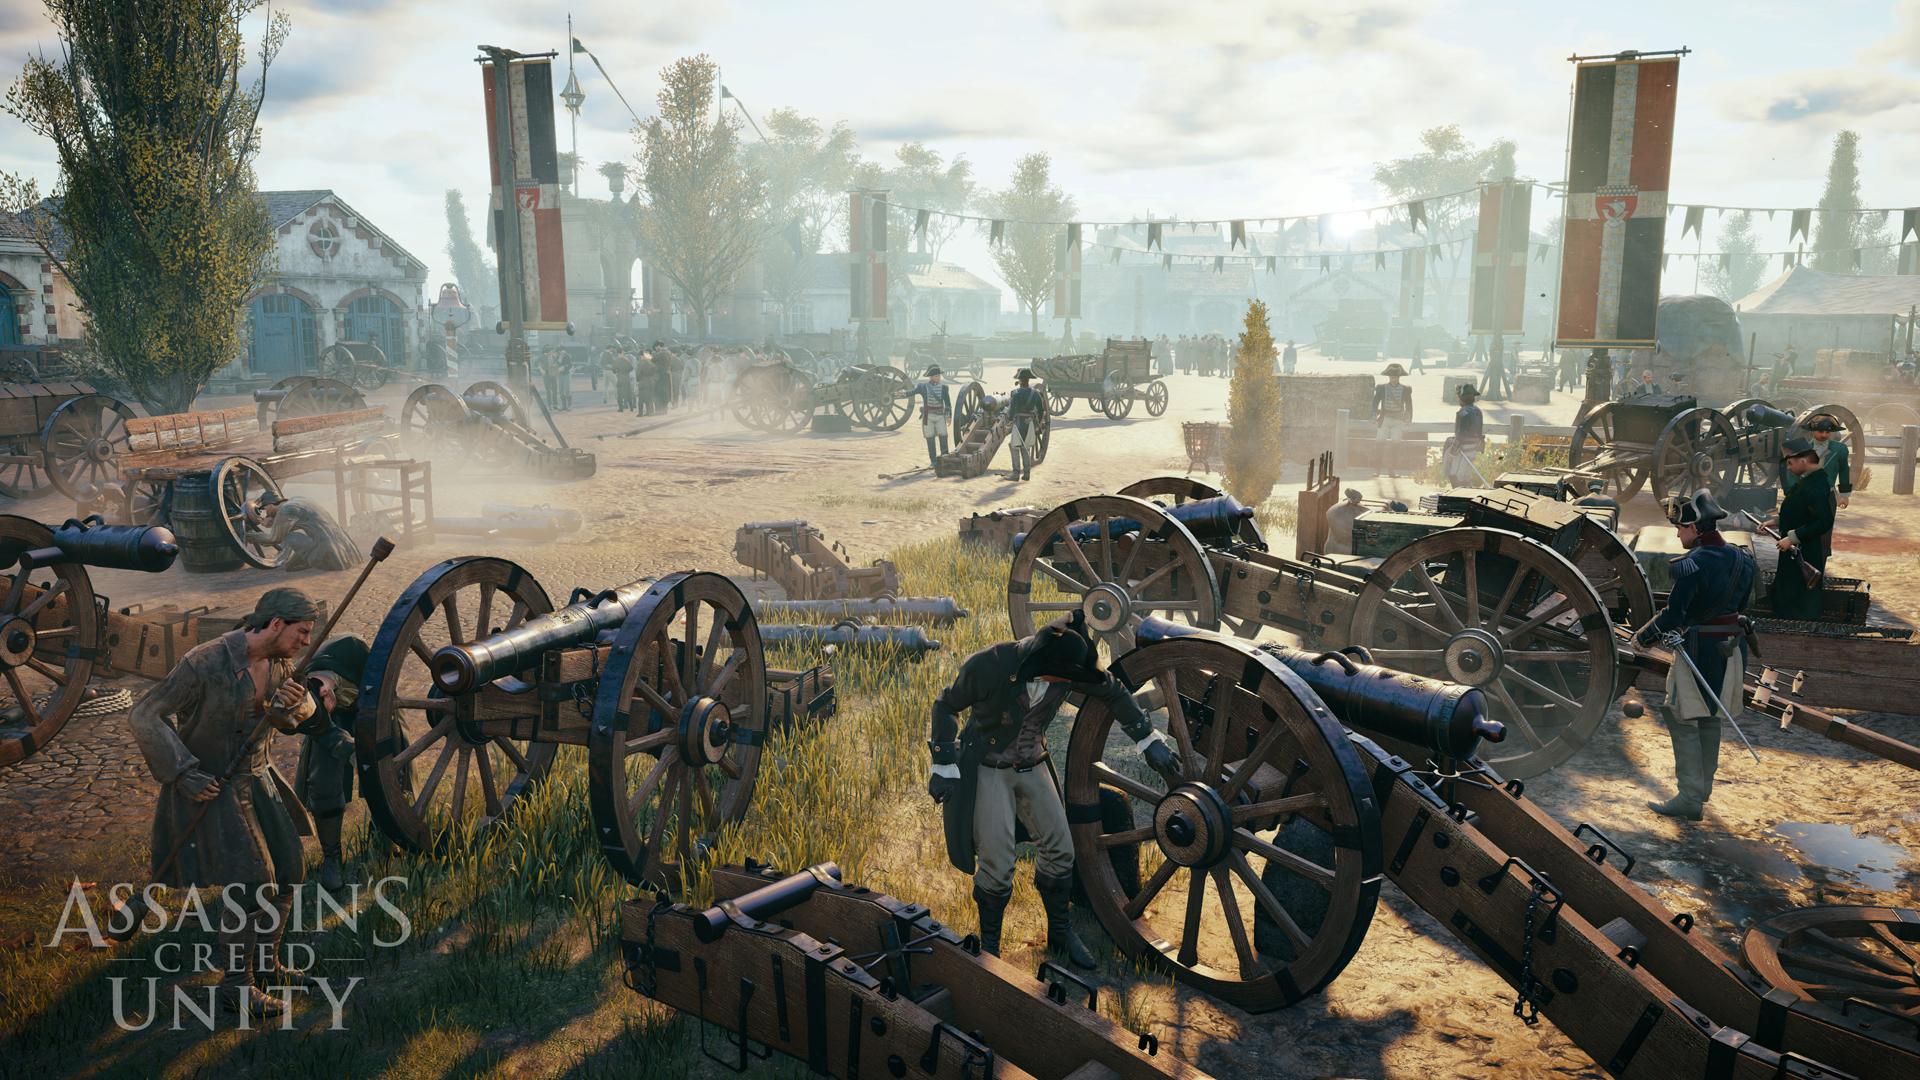 [FIXO] Assassin's Creed Unity Assassin%27s_Creed_Unity_District_LesInvalides_166325